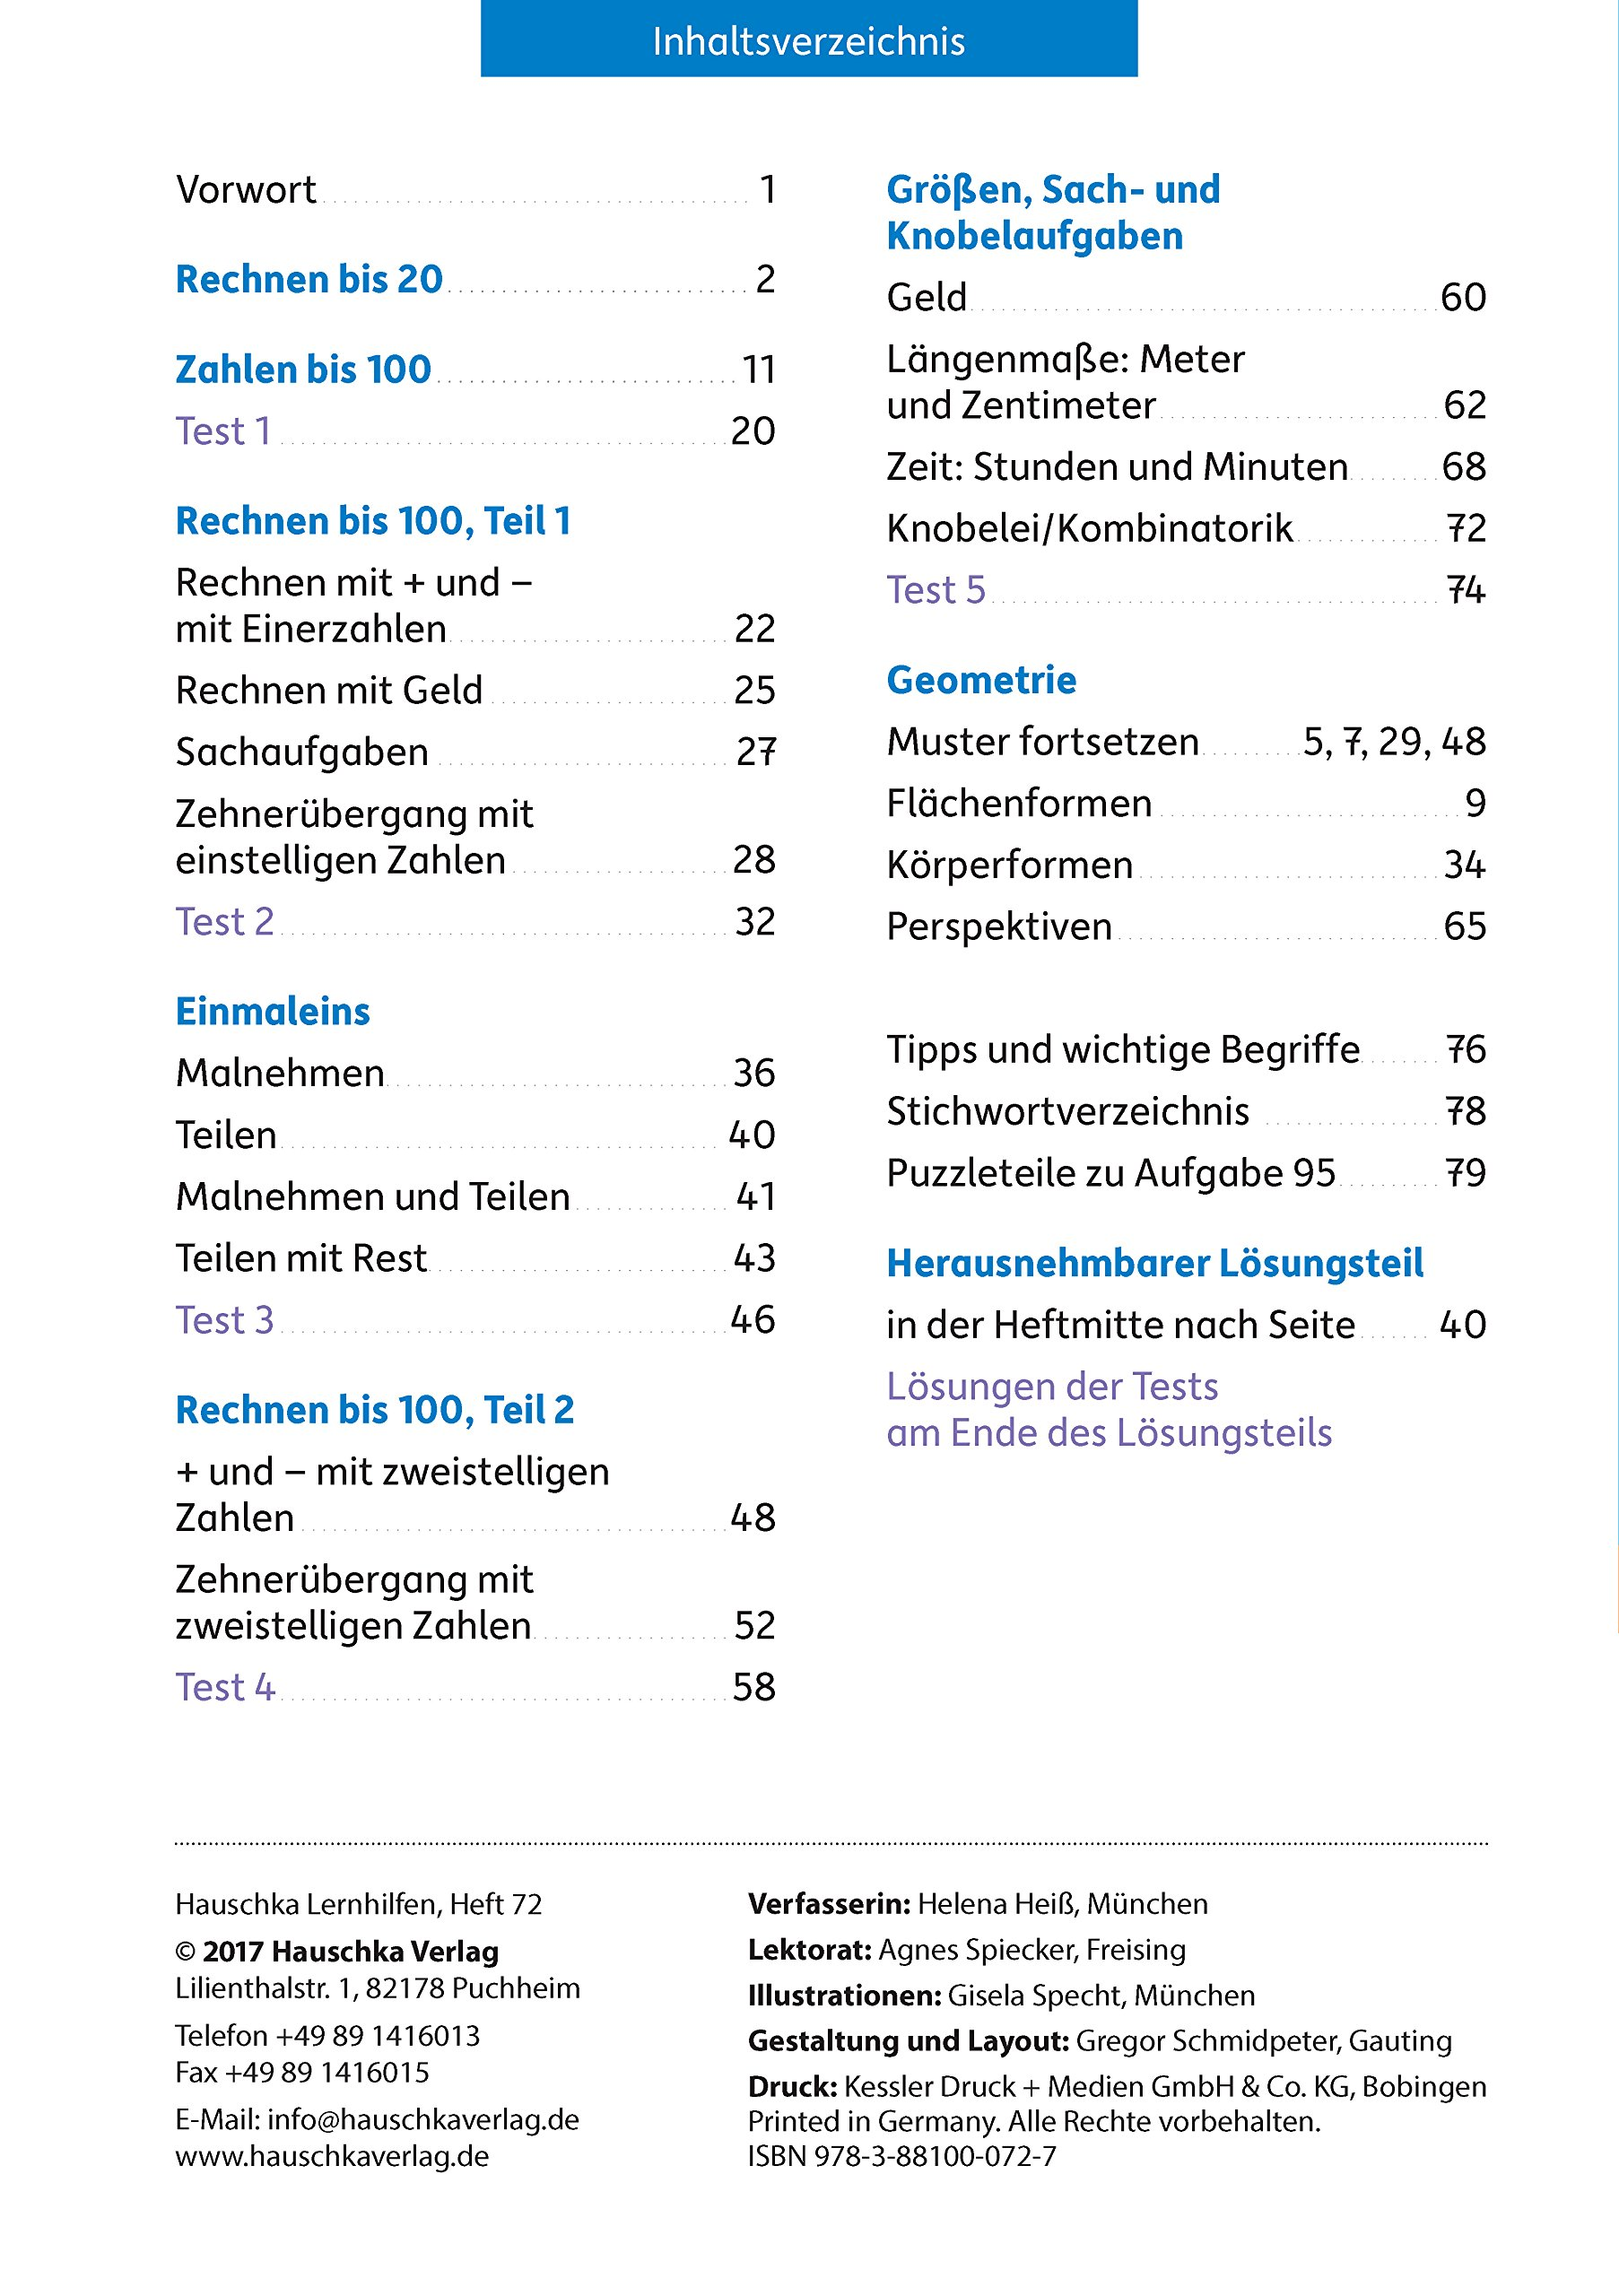 Mathe trainieren 2. Klasse: Amazon.de: Helena Heiß, Gisela Specht ...